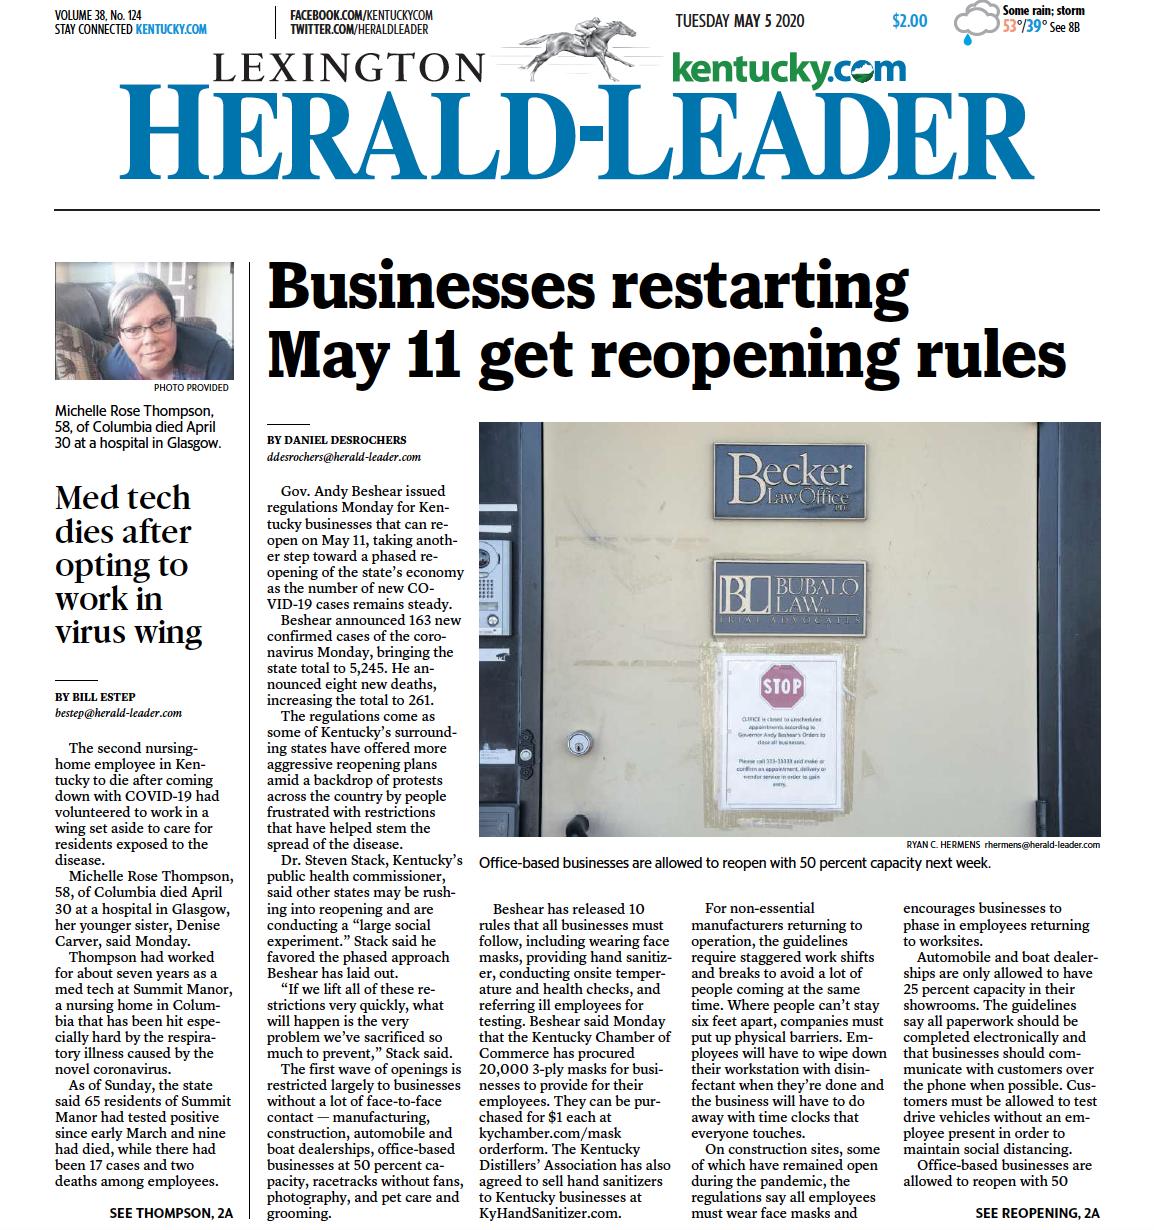 Lexington Herald-Leader Becker Law Article